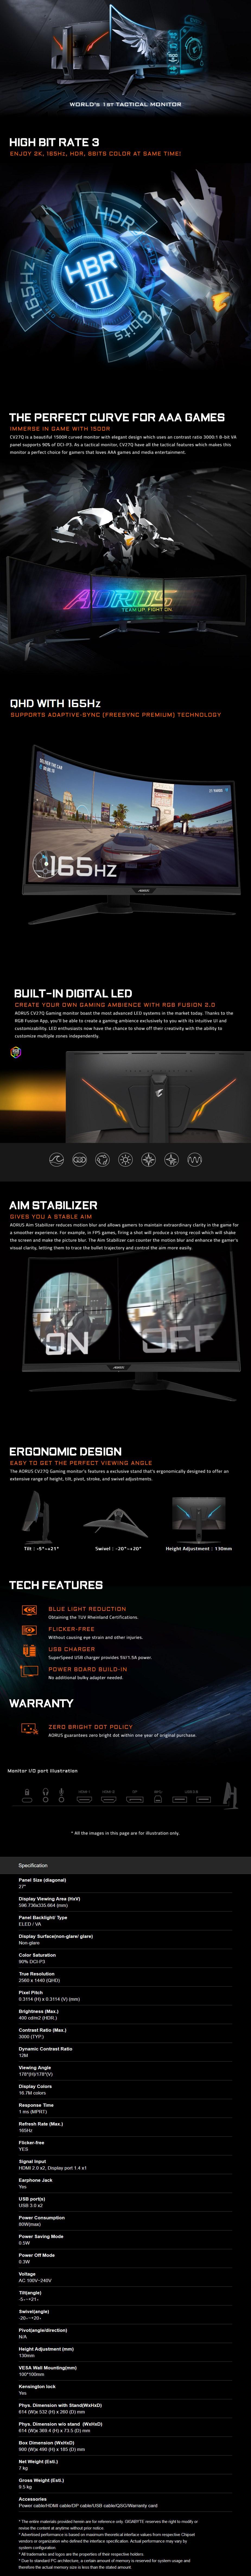 "Gigabyte AORUS CV27Q 27"" 165Hz QHD FreeSync 2 Curved Gaming VA Monitor - Desktop Overview 1"